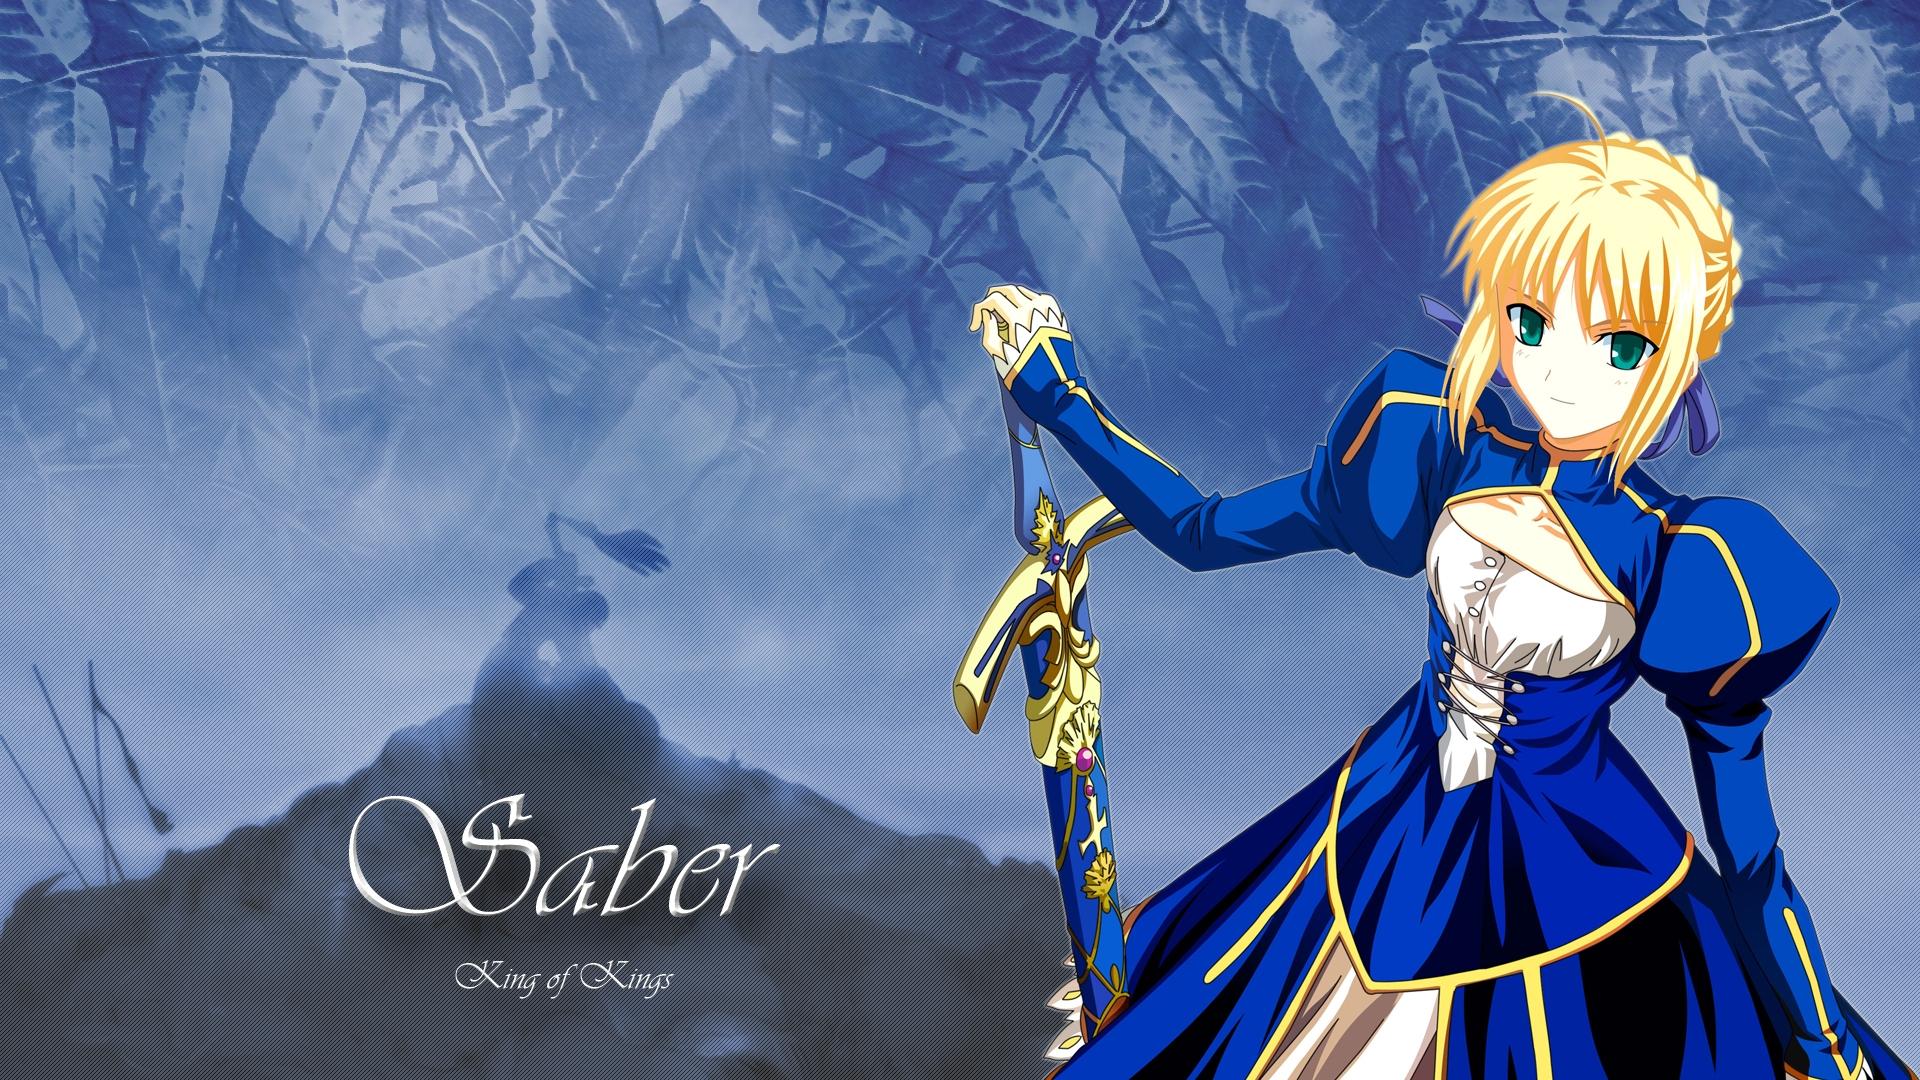 Wallpaper : illustration, blonde, anime, dress, sword, cute